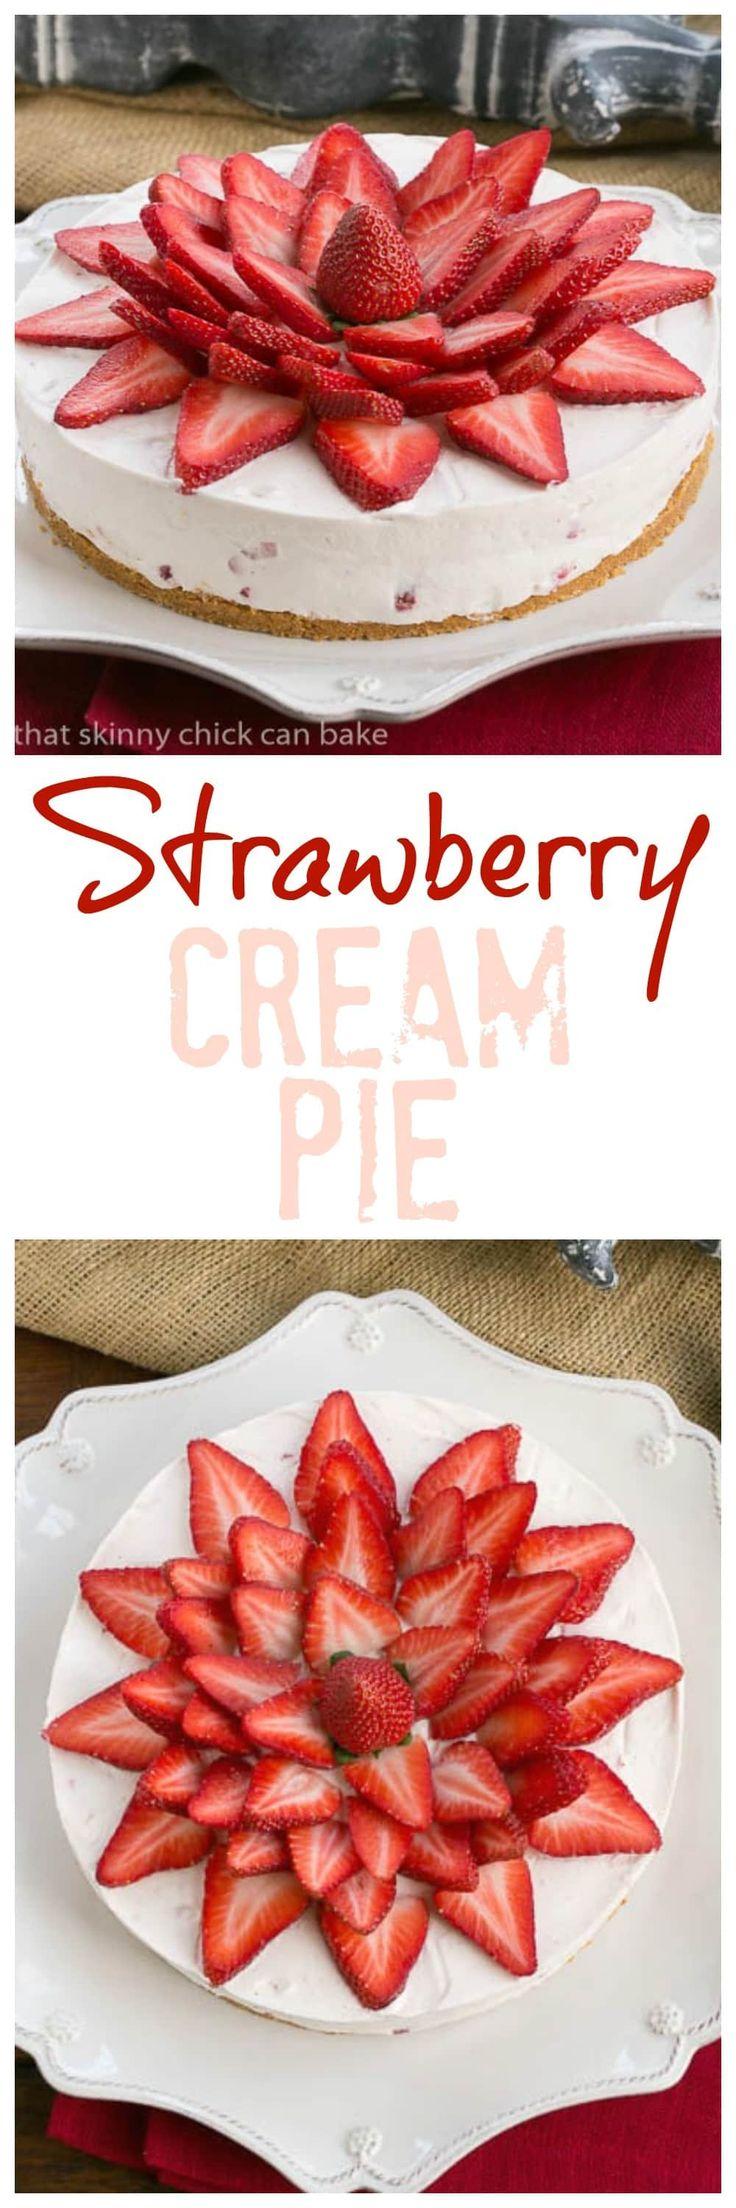 Strawberry Vanilla Cream Pie | An exquisite strawberry and cream dessert! @lizzydo